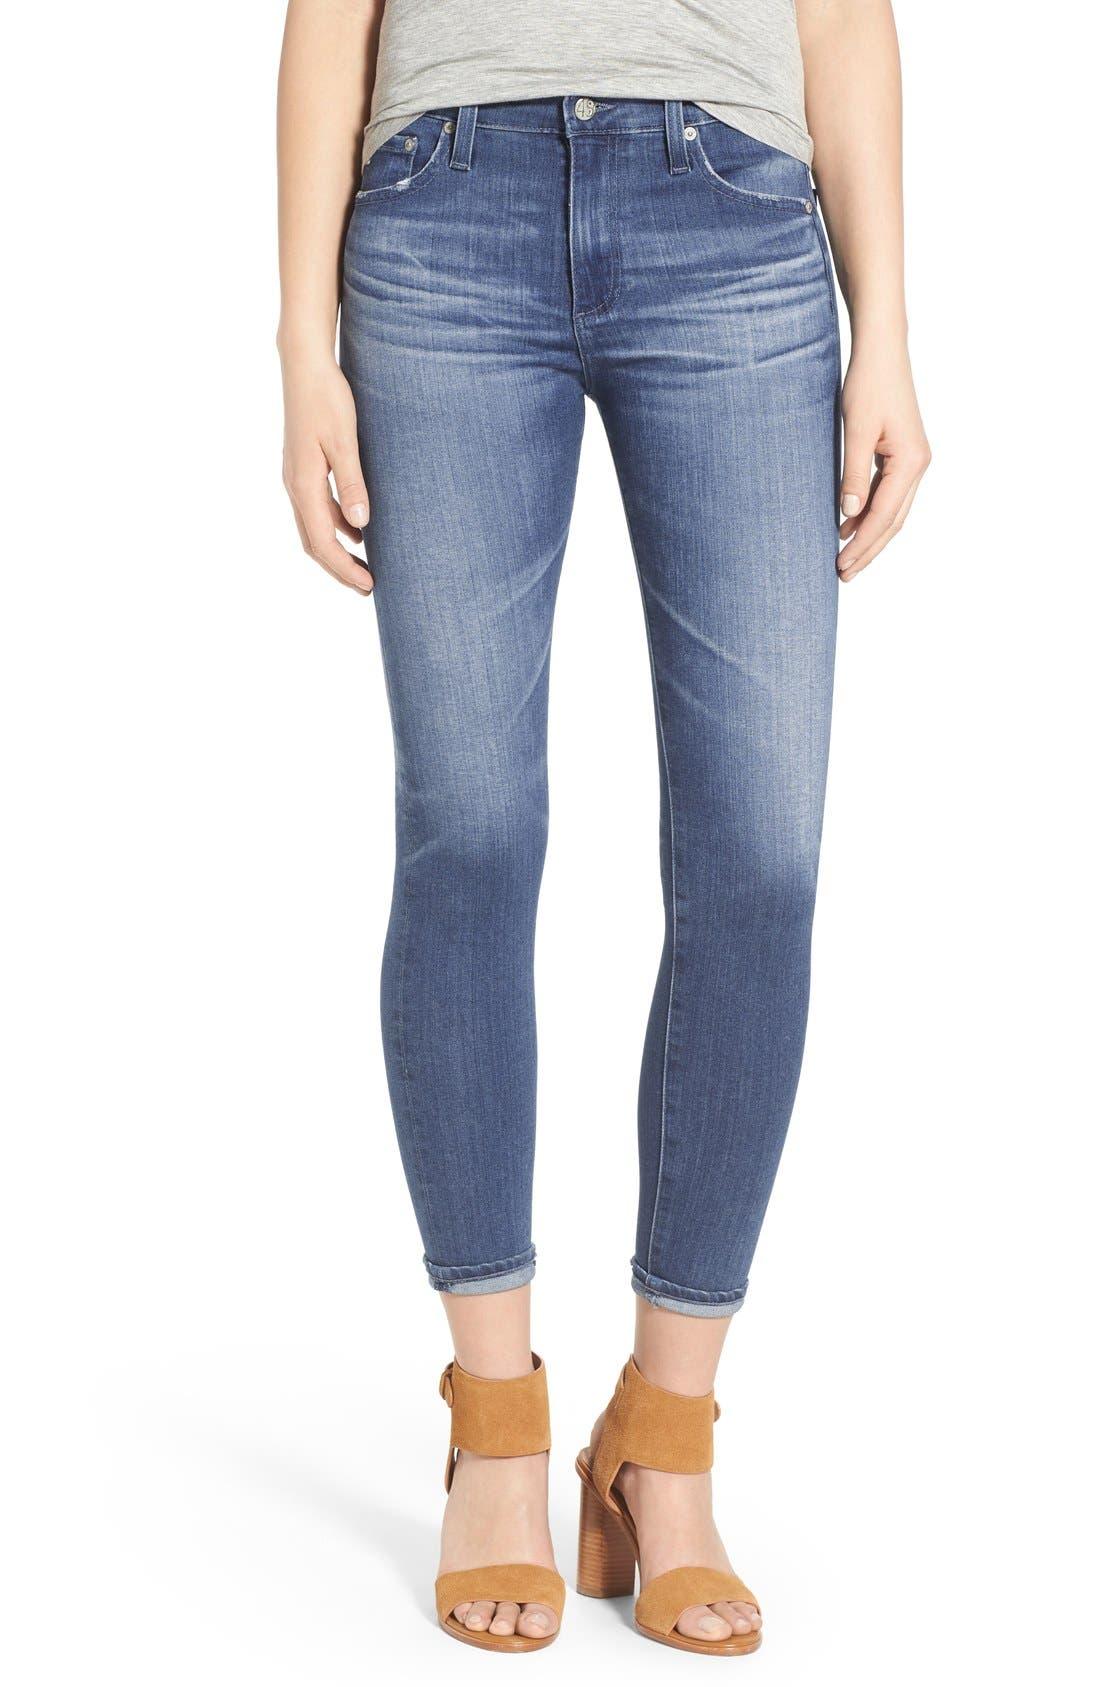 AG 'The Farrah' High Rise Crop Skinny Jeans, Main, color, 400